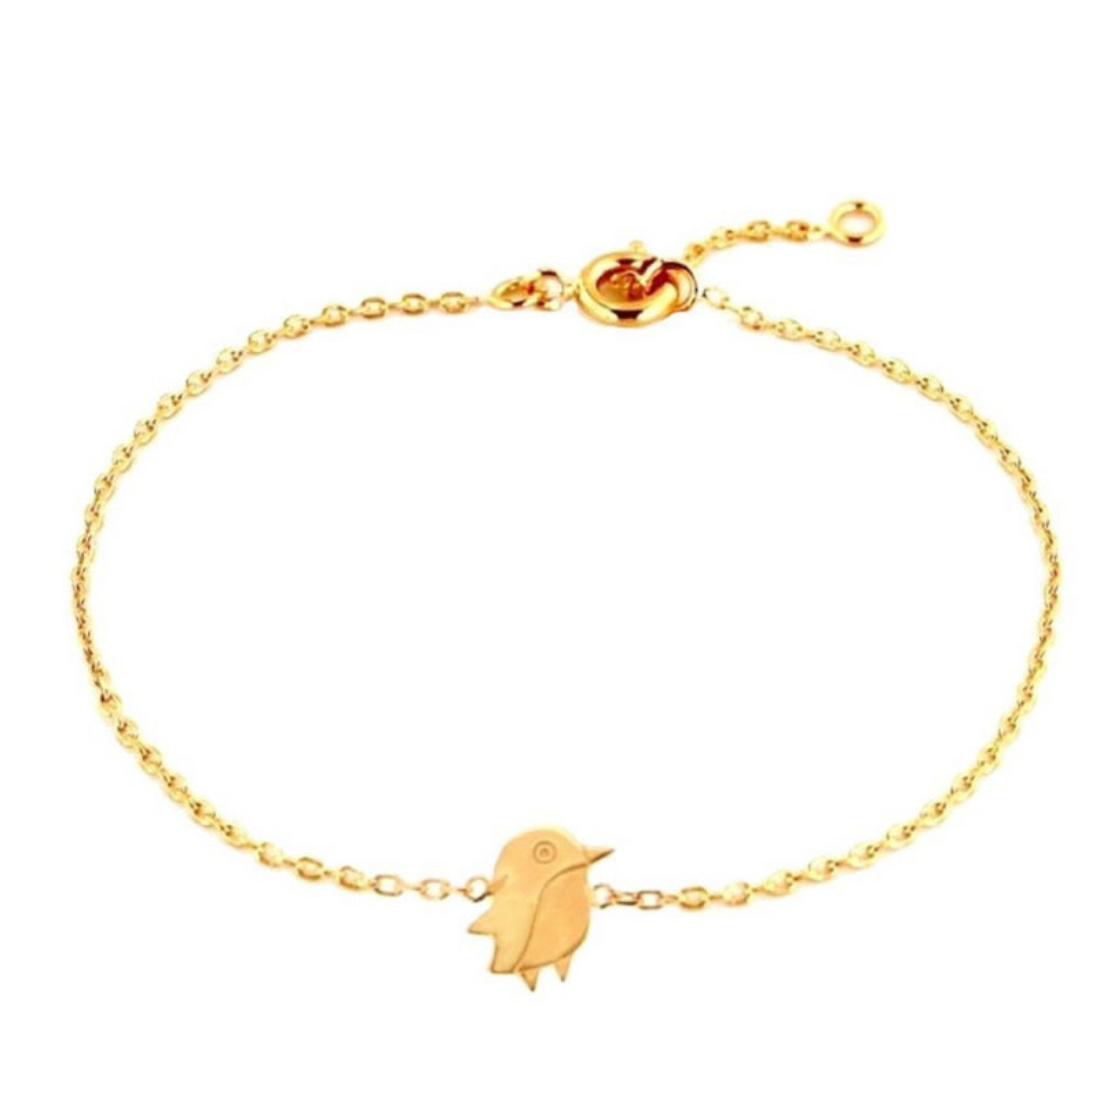 Bracelet Chainemaille Large  Plaque Or Breloque Turquoise Corail Médaille Promo